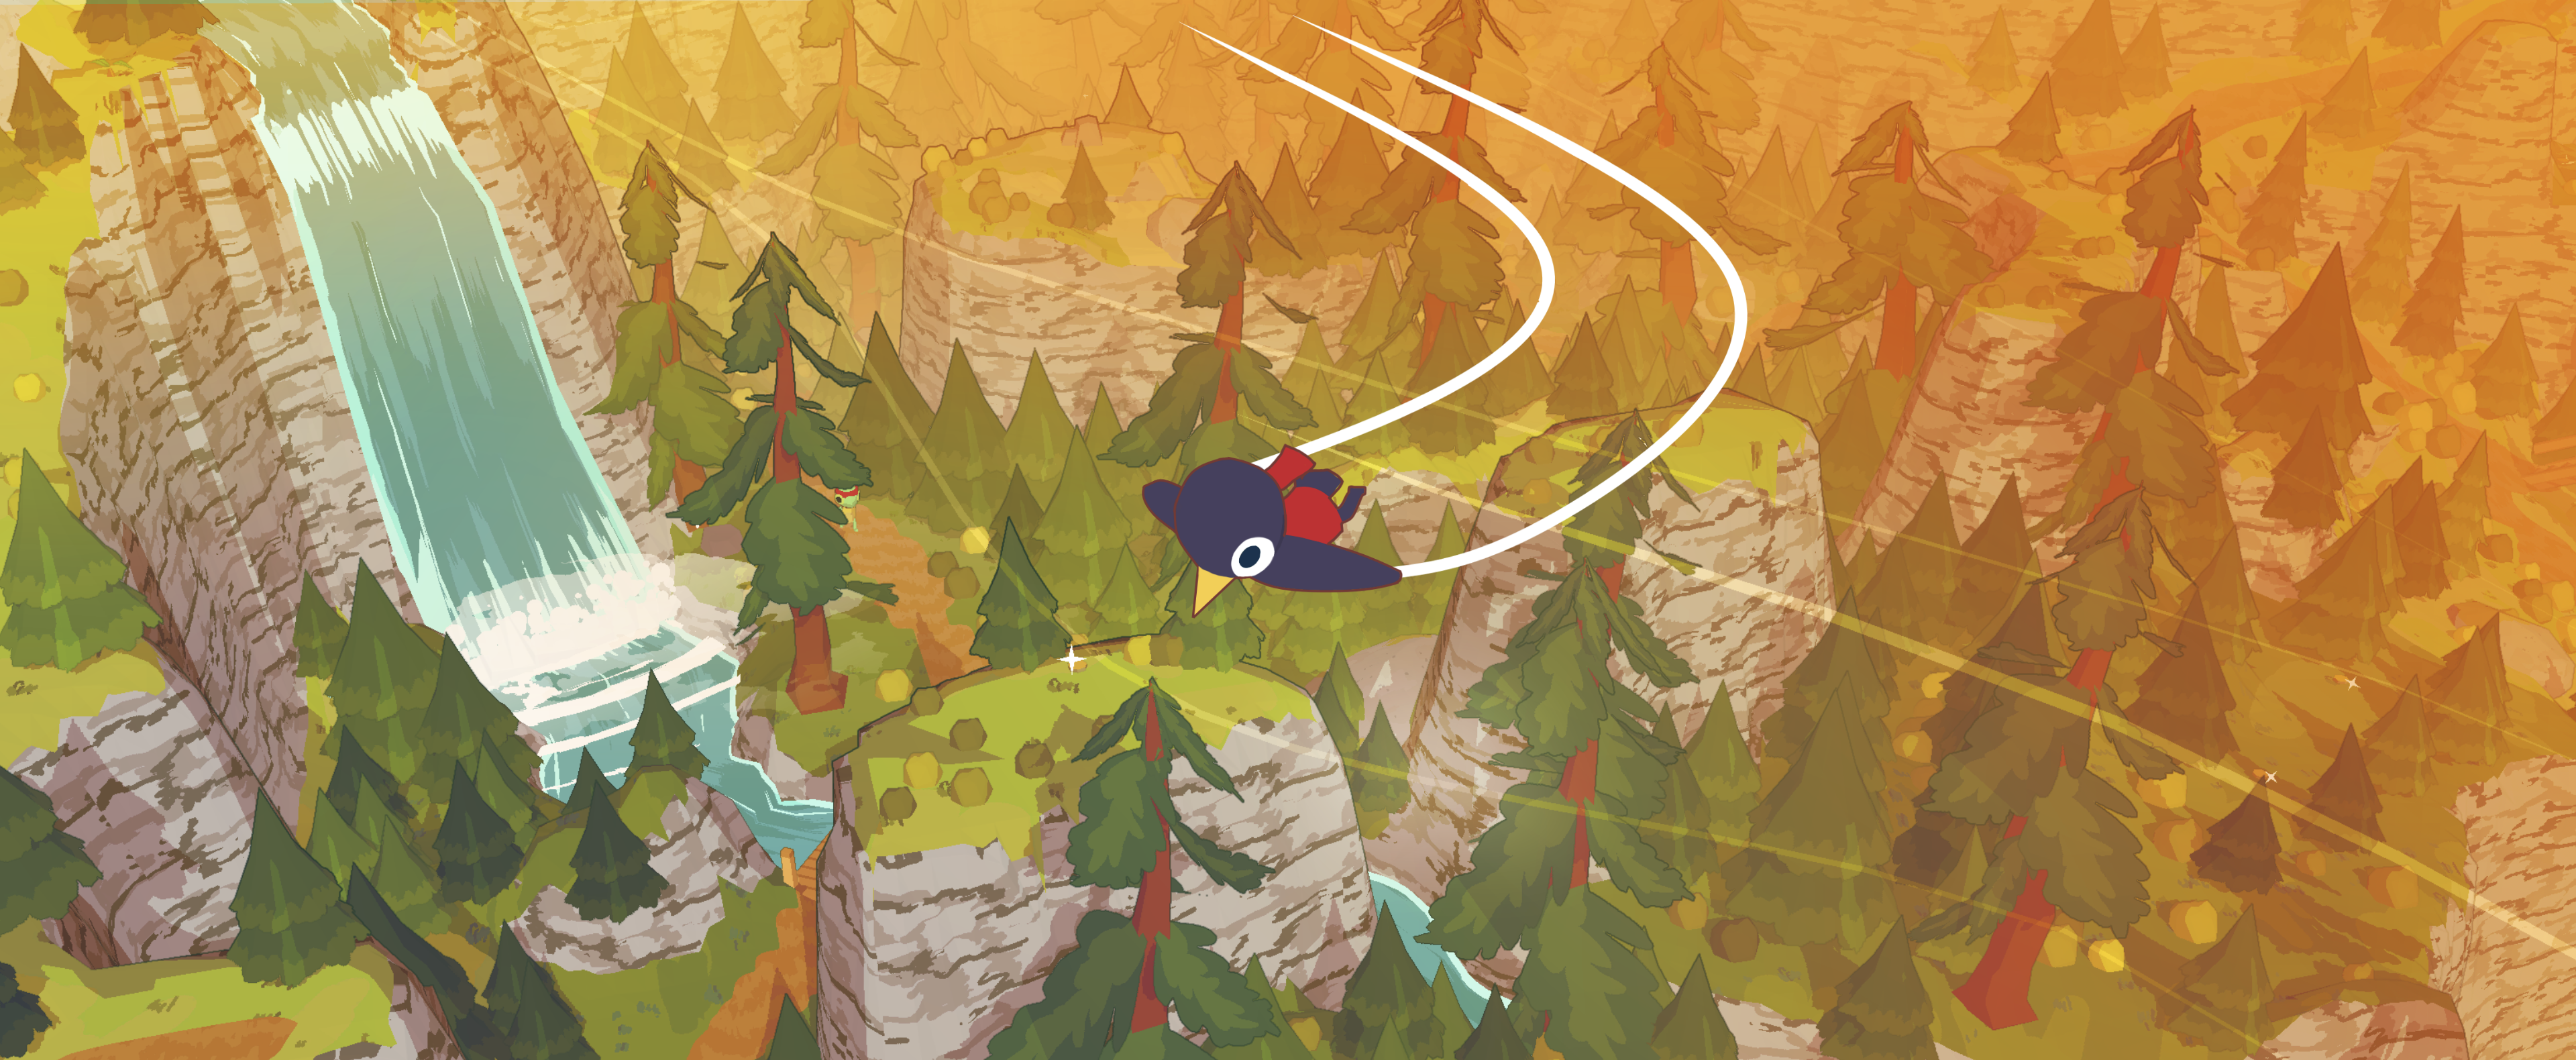 A Short Hike screenshot